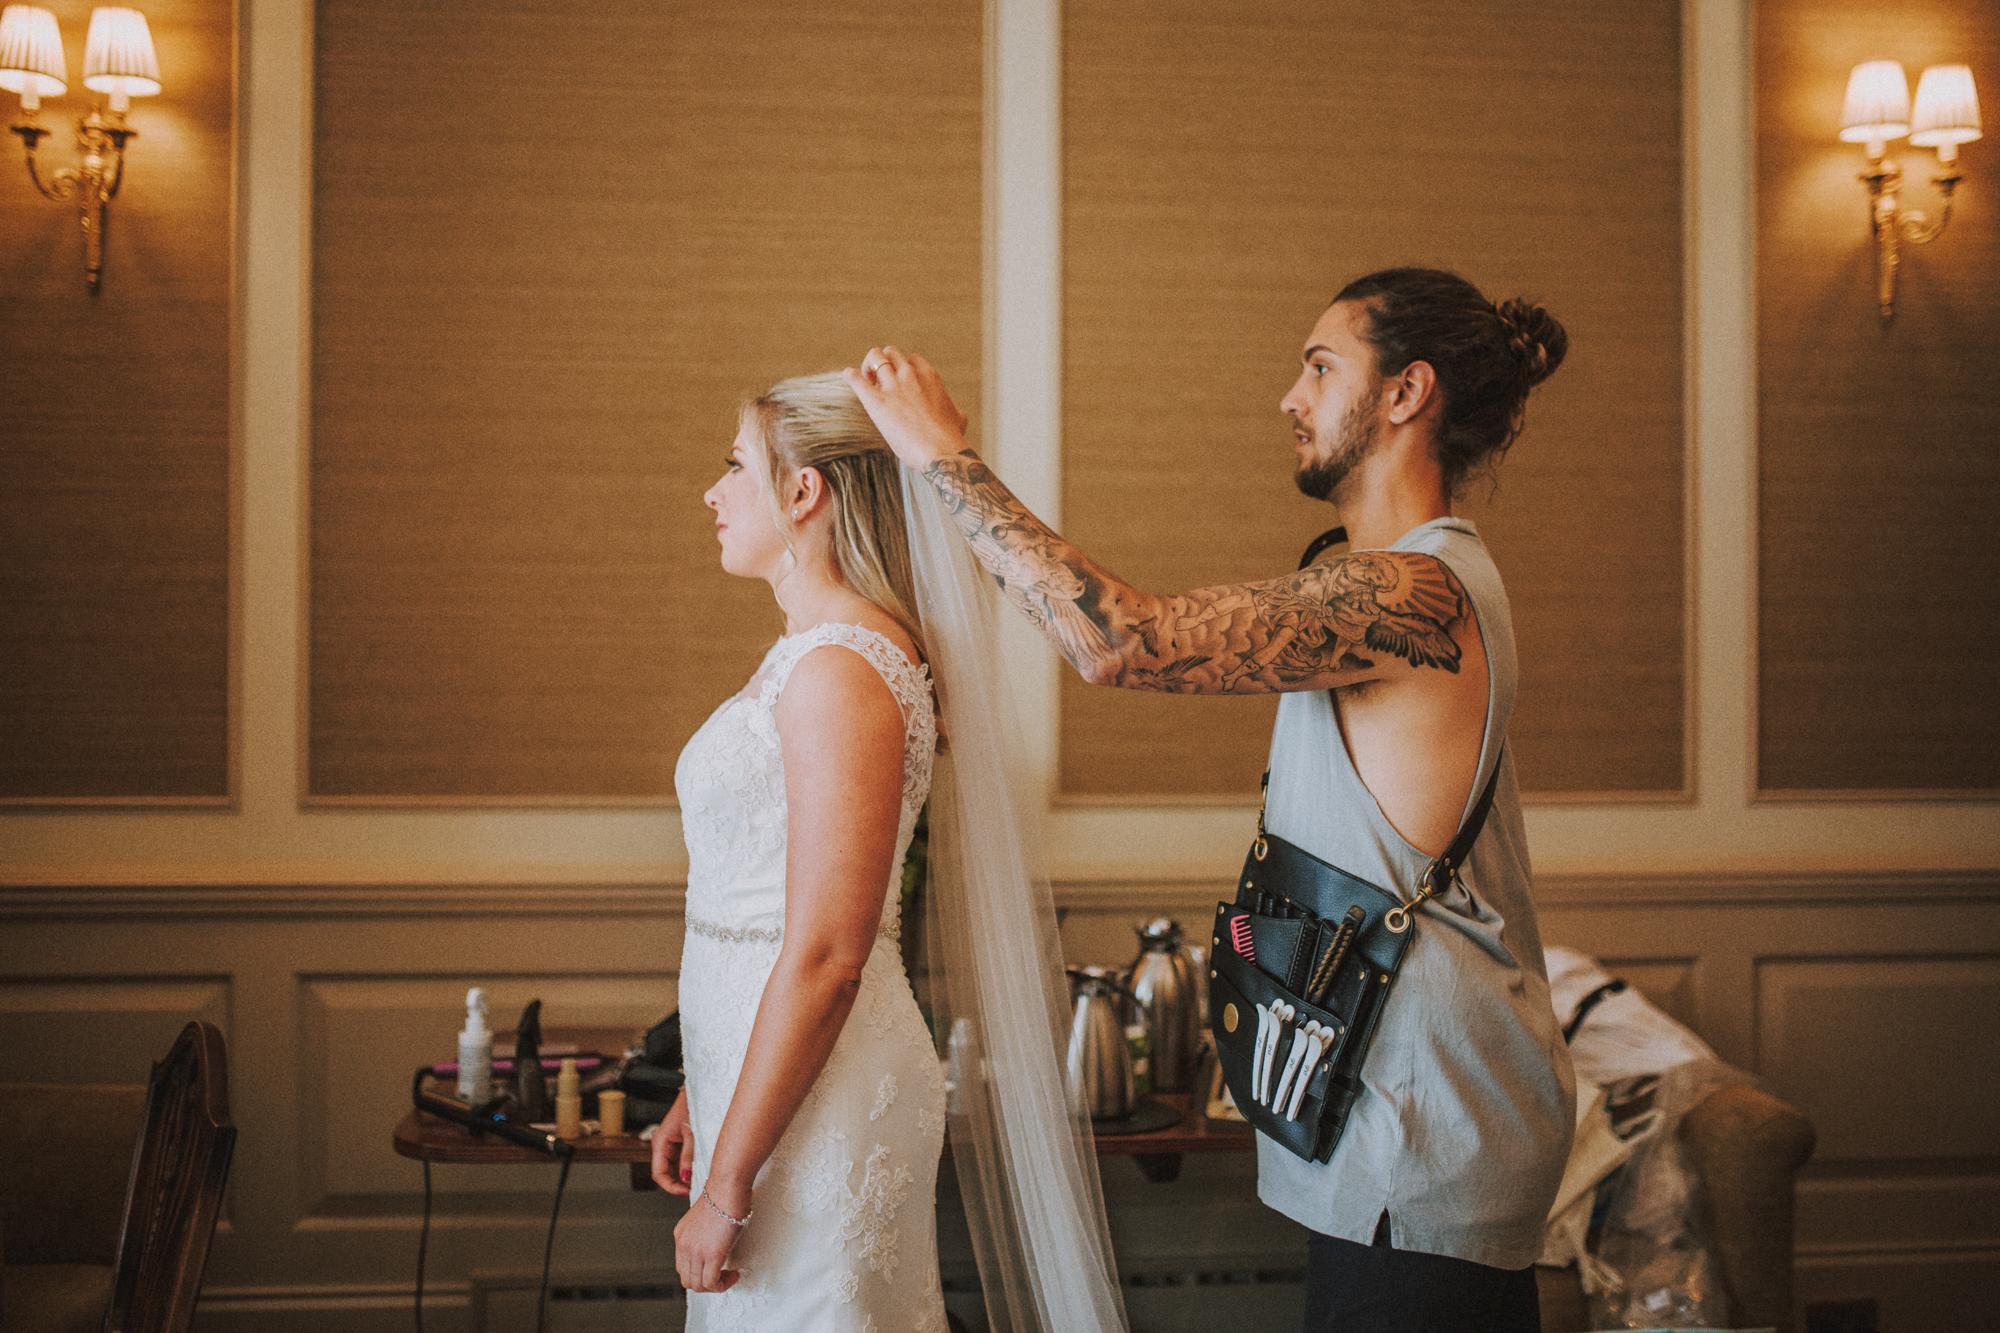 bowcliffe hall wedding photographers yorkshire-21.jpg